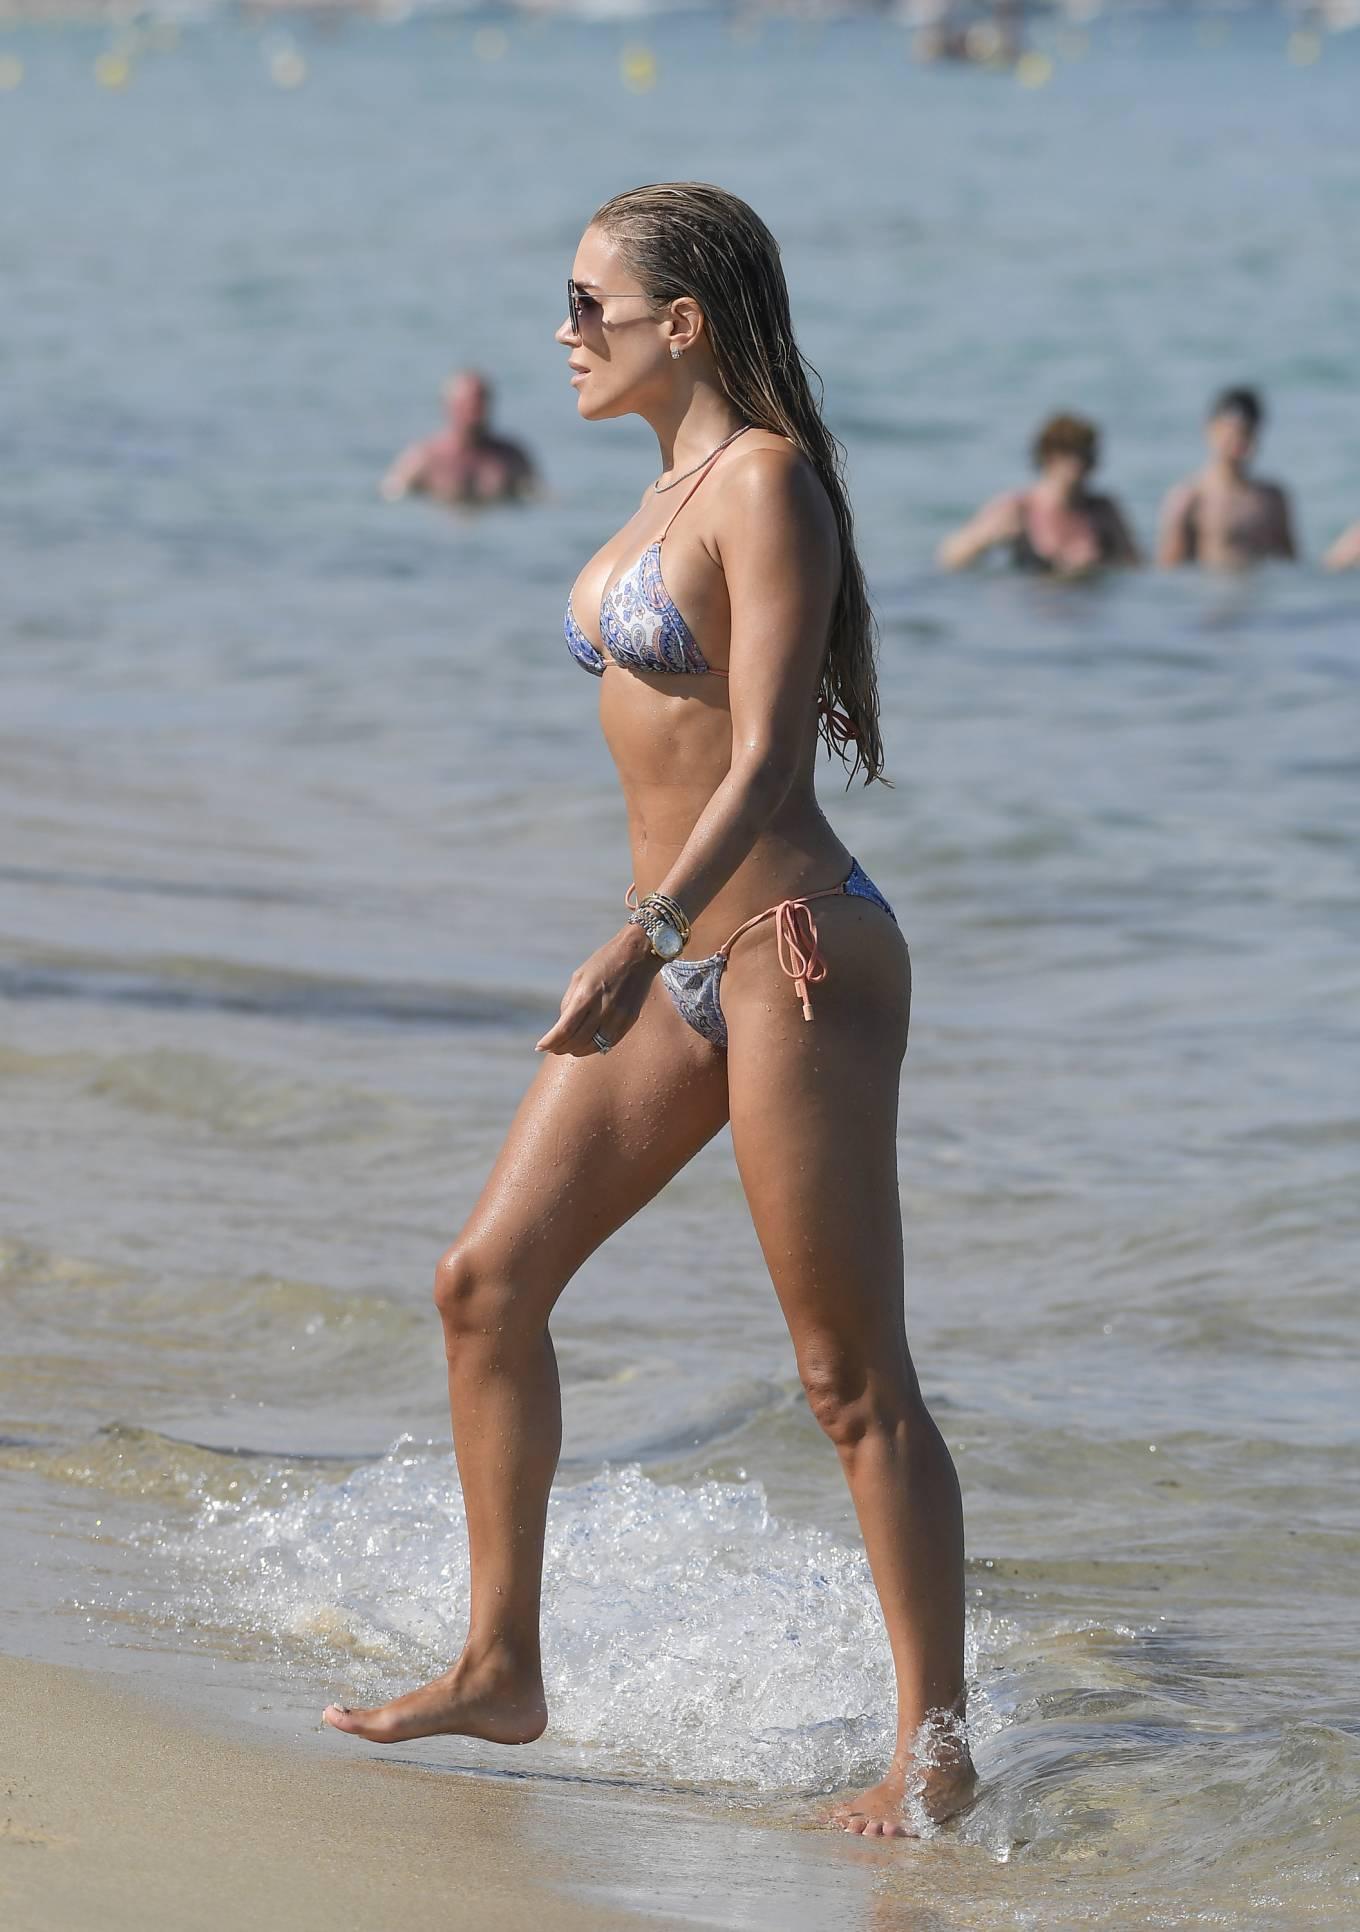 Sylvie Meis 2021 : Sylvie Meis – In a bikini with her husband Niclas Castello on the beach La Réserve in Ramatuelle-12